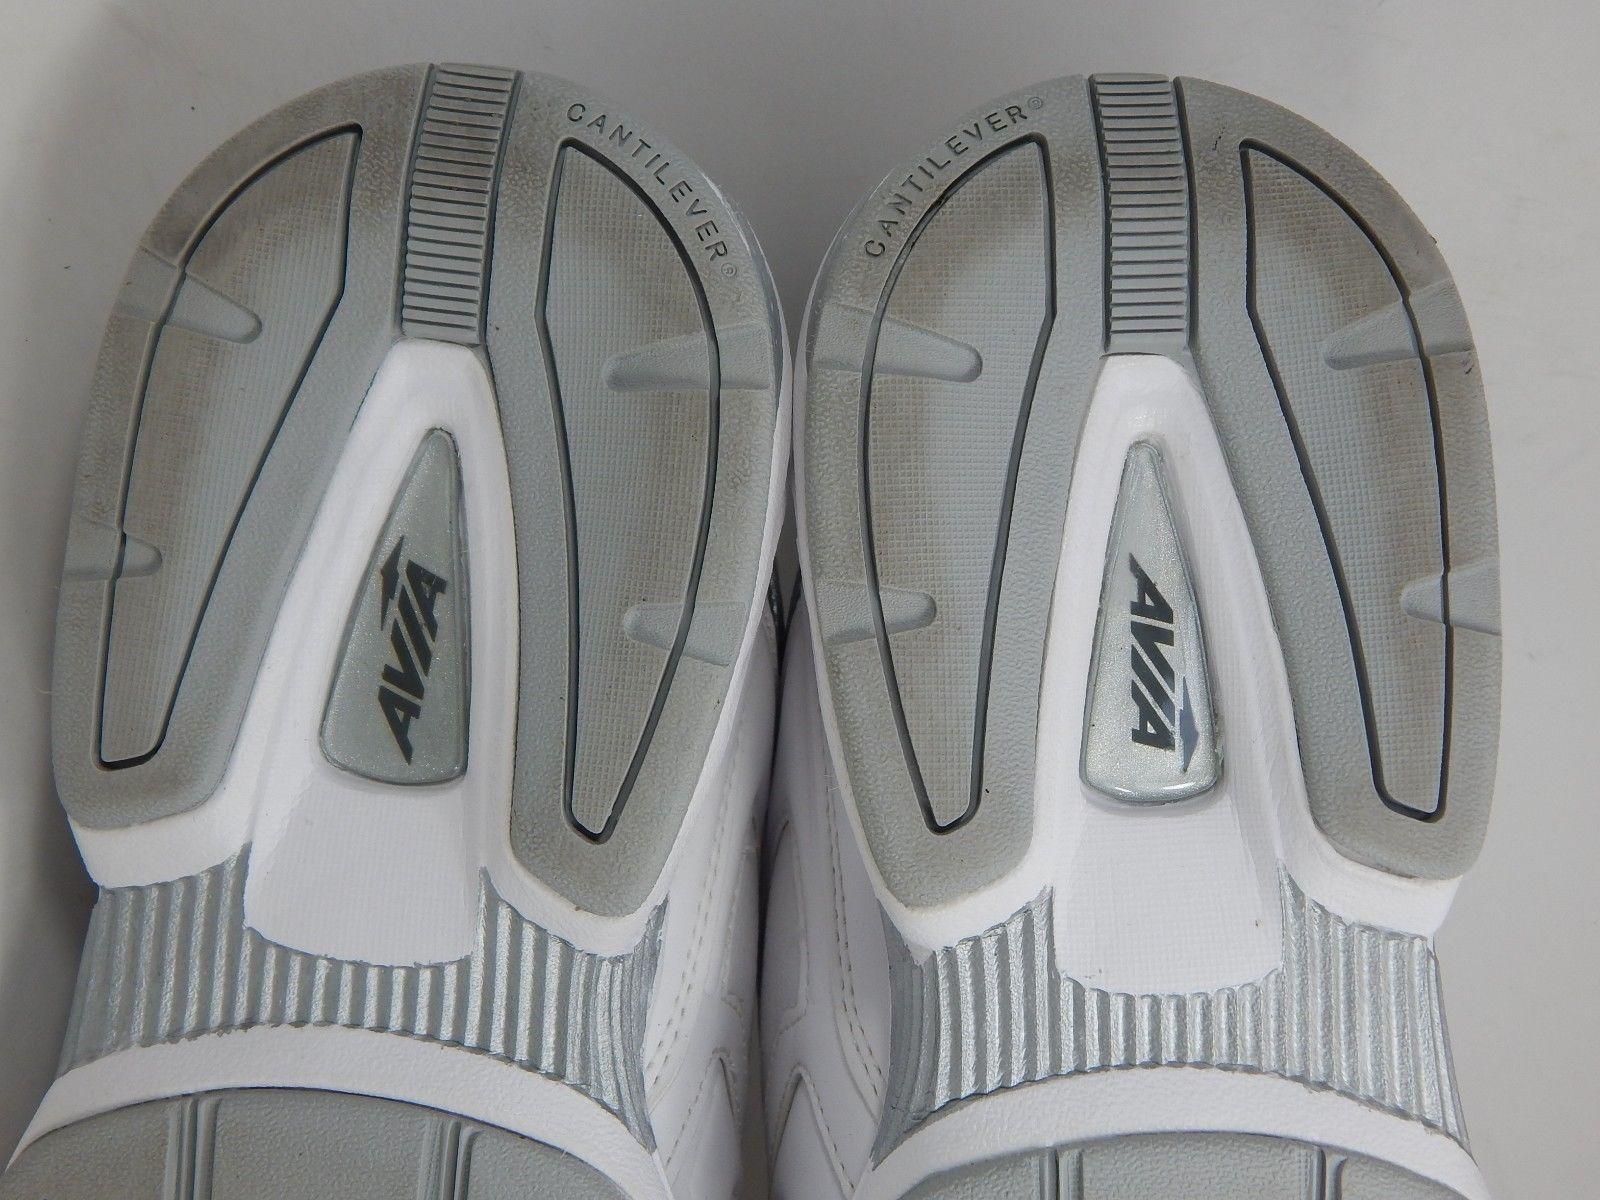 Avia Cantilever Walking Shoes